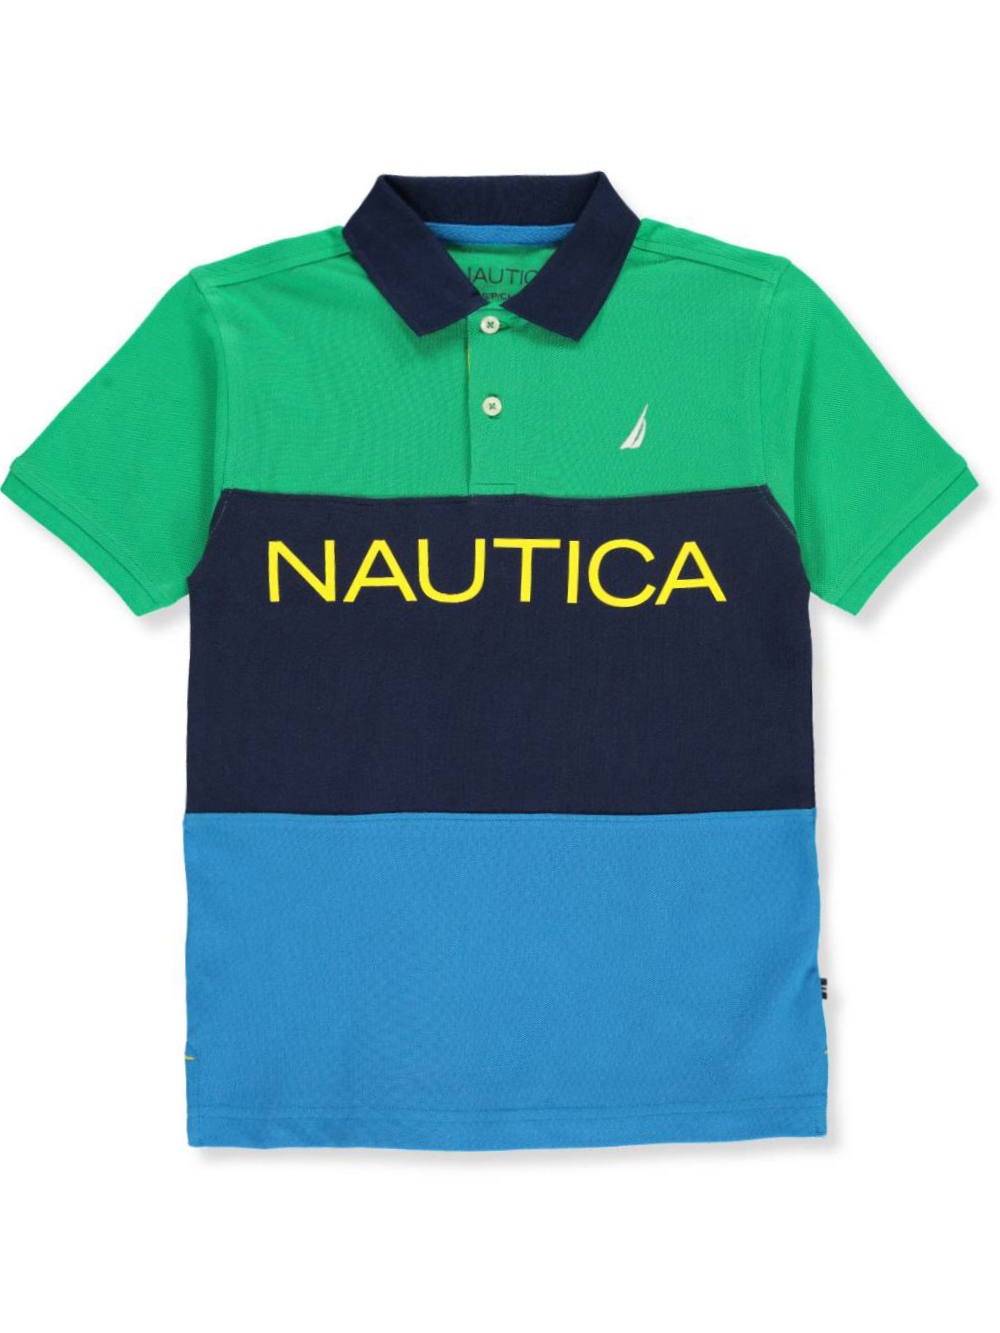 659920713b Boys' Blocked Logo Pique Polo by Nautica in Bright green